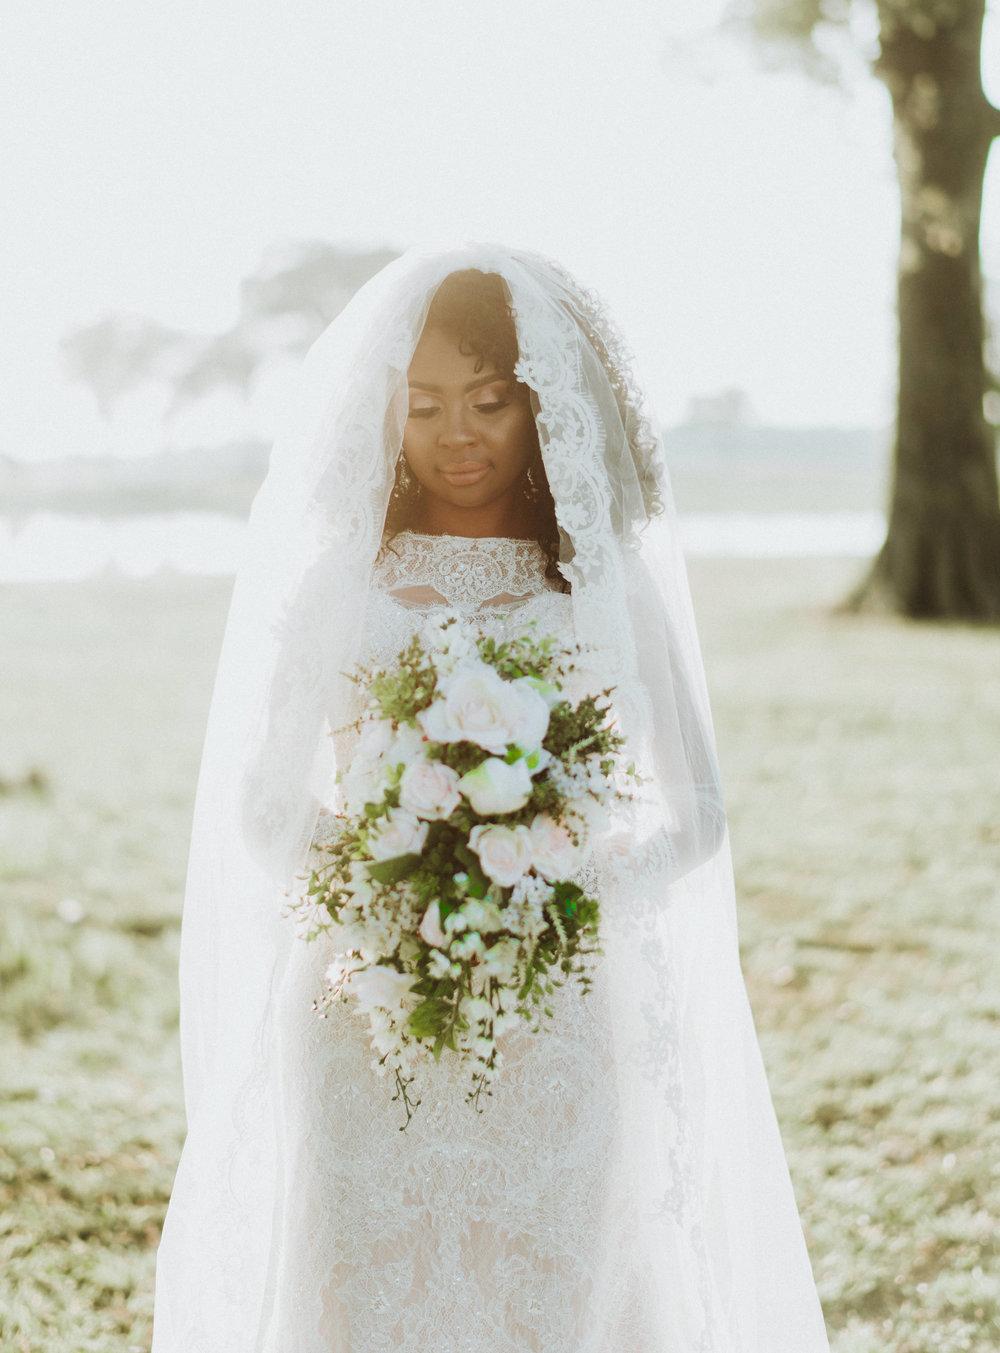 Jalainna's Bridals - 017.jpg